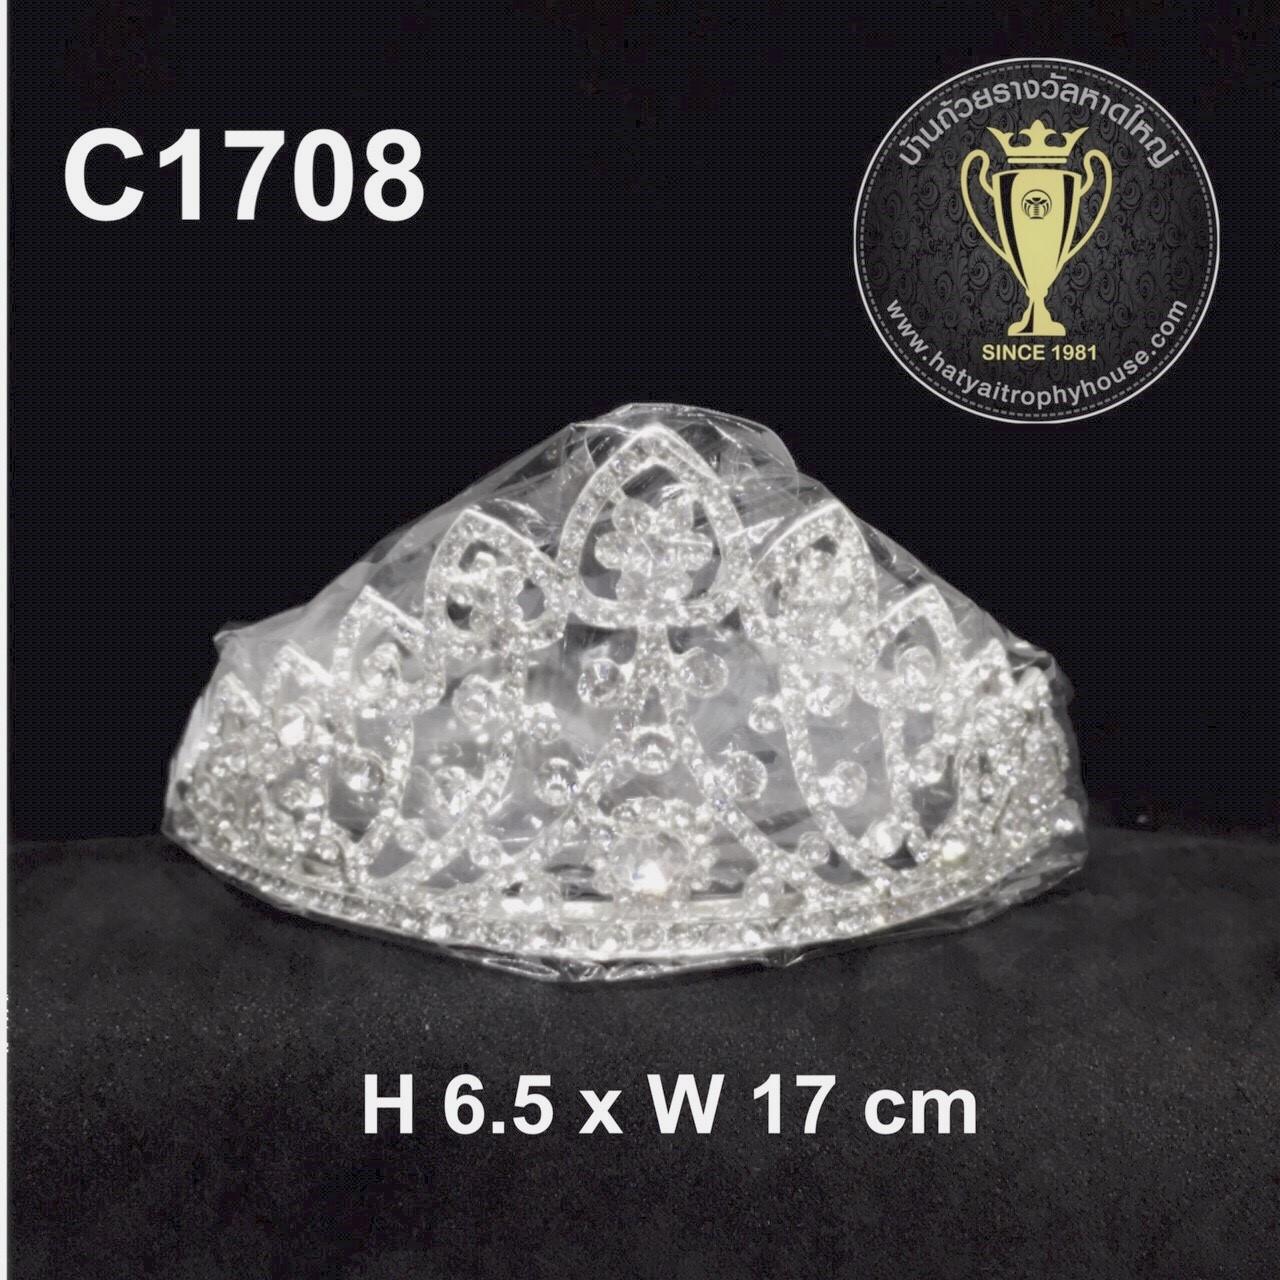 C1708